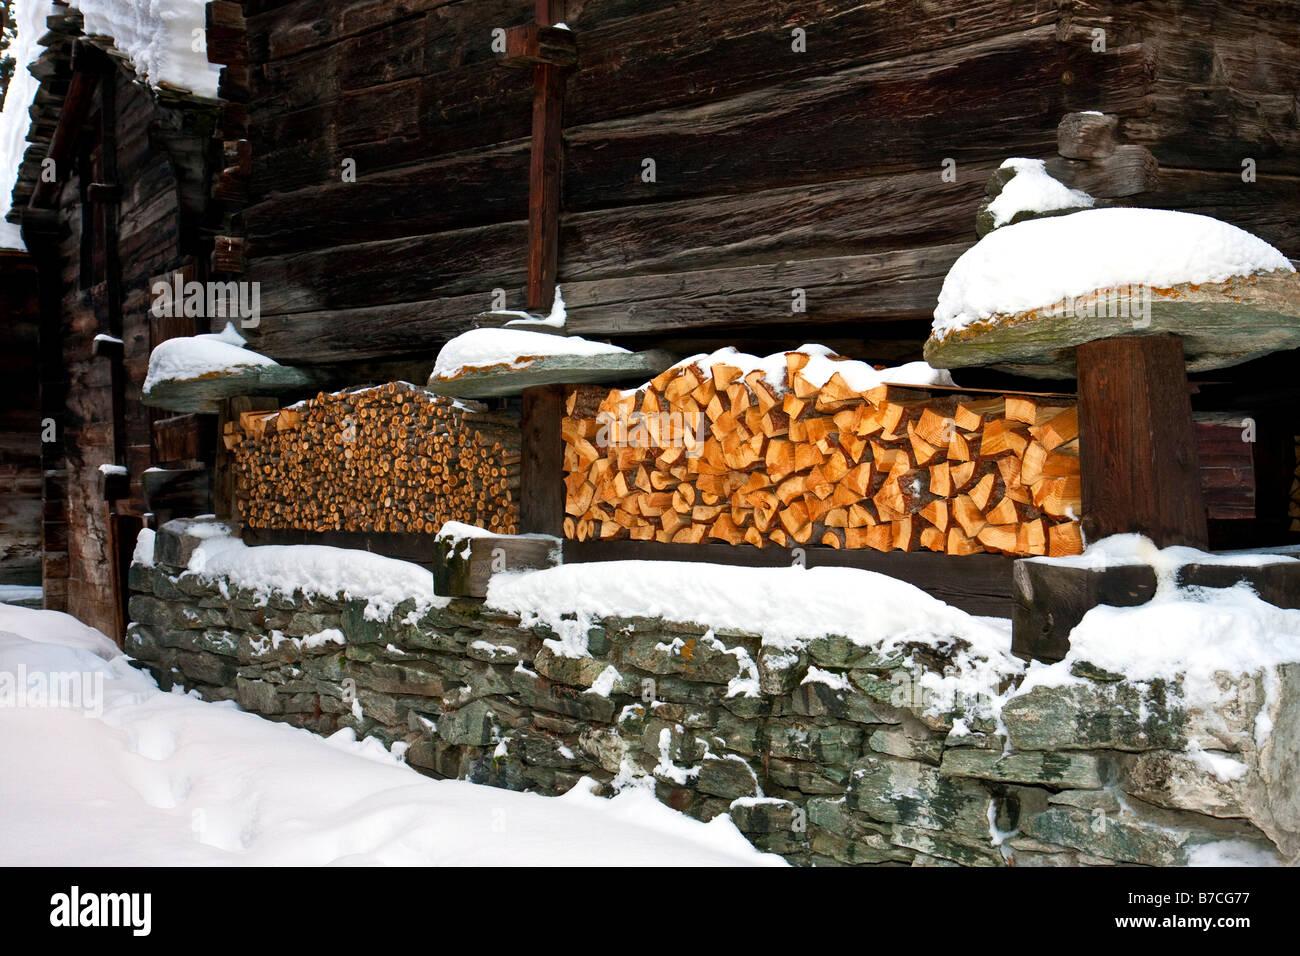 Fire wood stacked for winter in Zermatt Switzerland - Stock Image